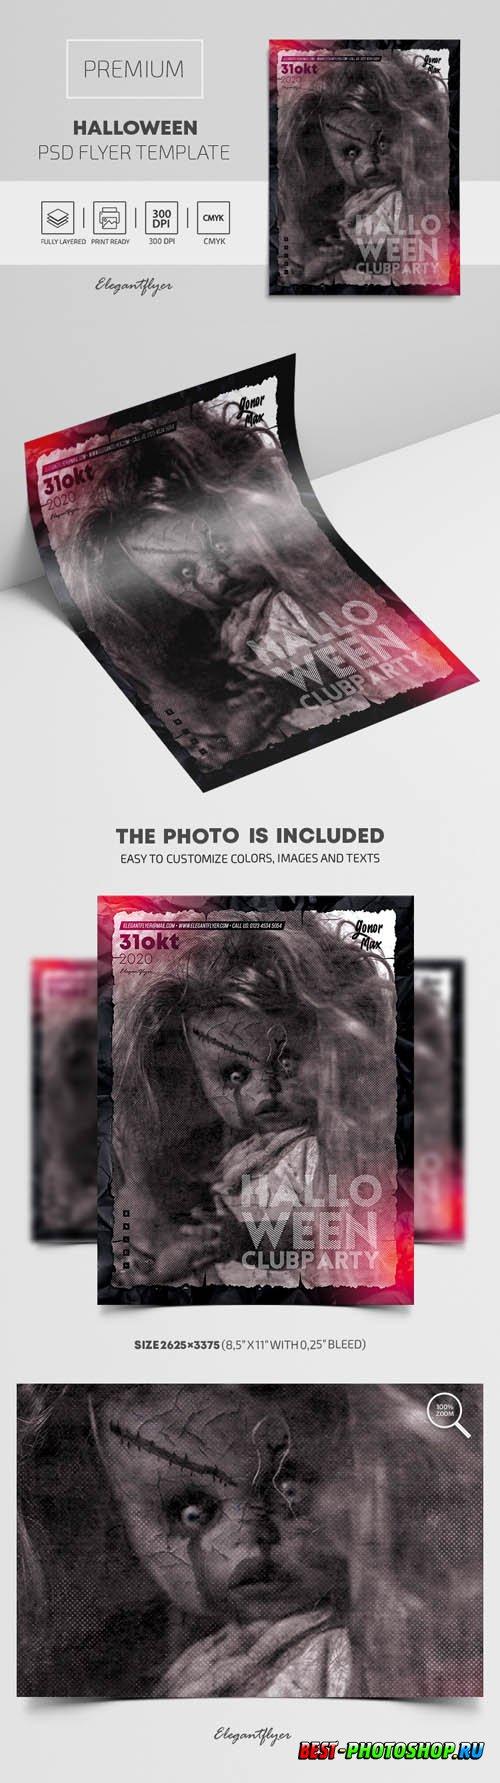 Halloween Premium PSD Flyer Template vol3